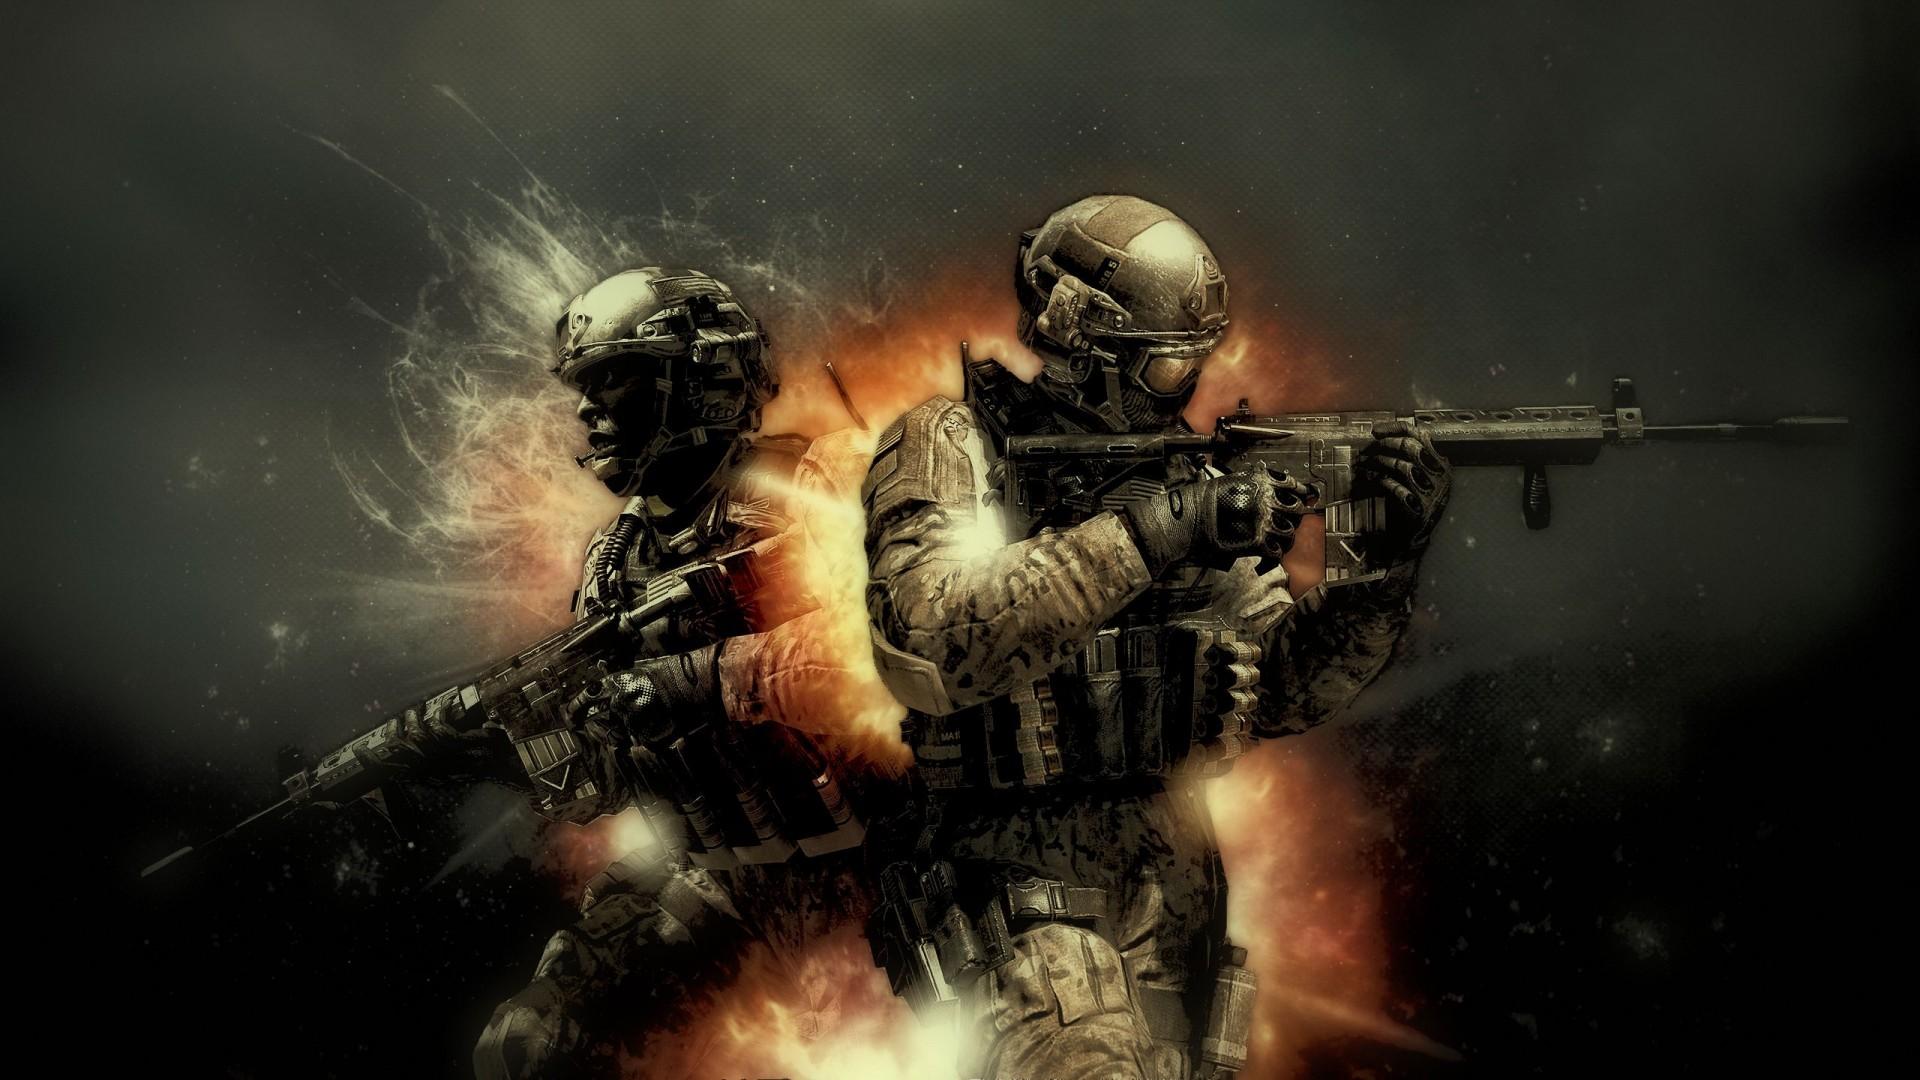 Call-of-Duty-Modern-Warfare-wallpaper-wp3603843